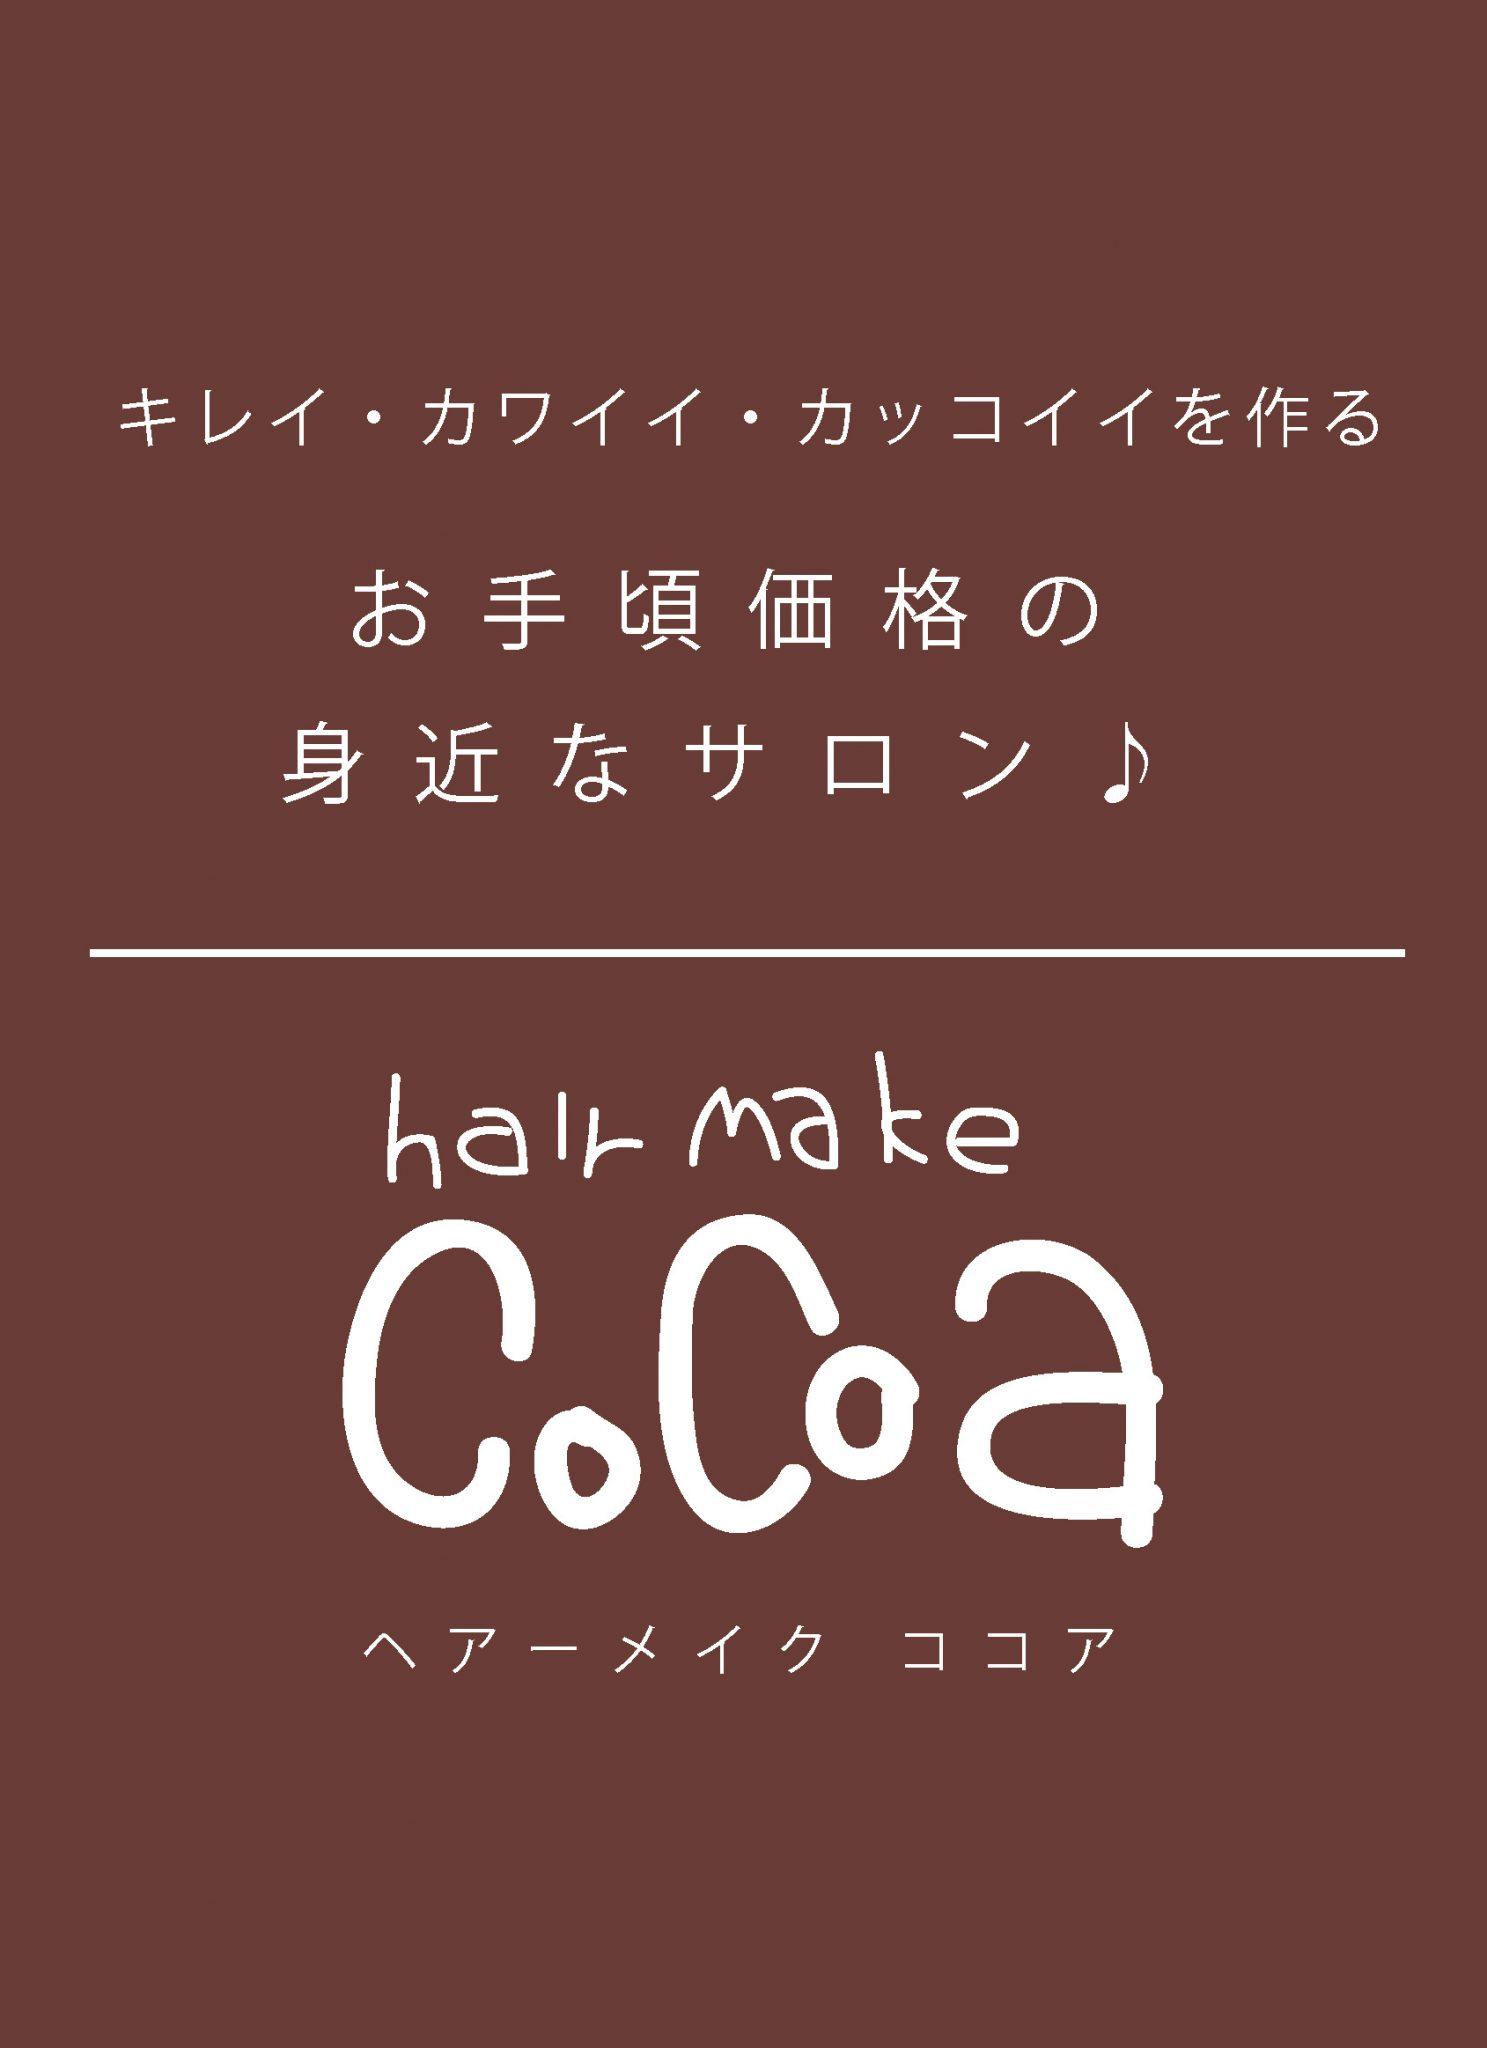 Hair Make COCOA